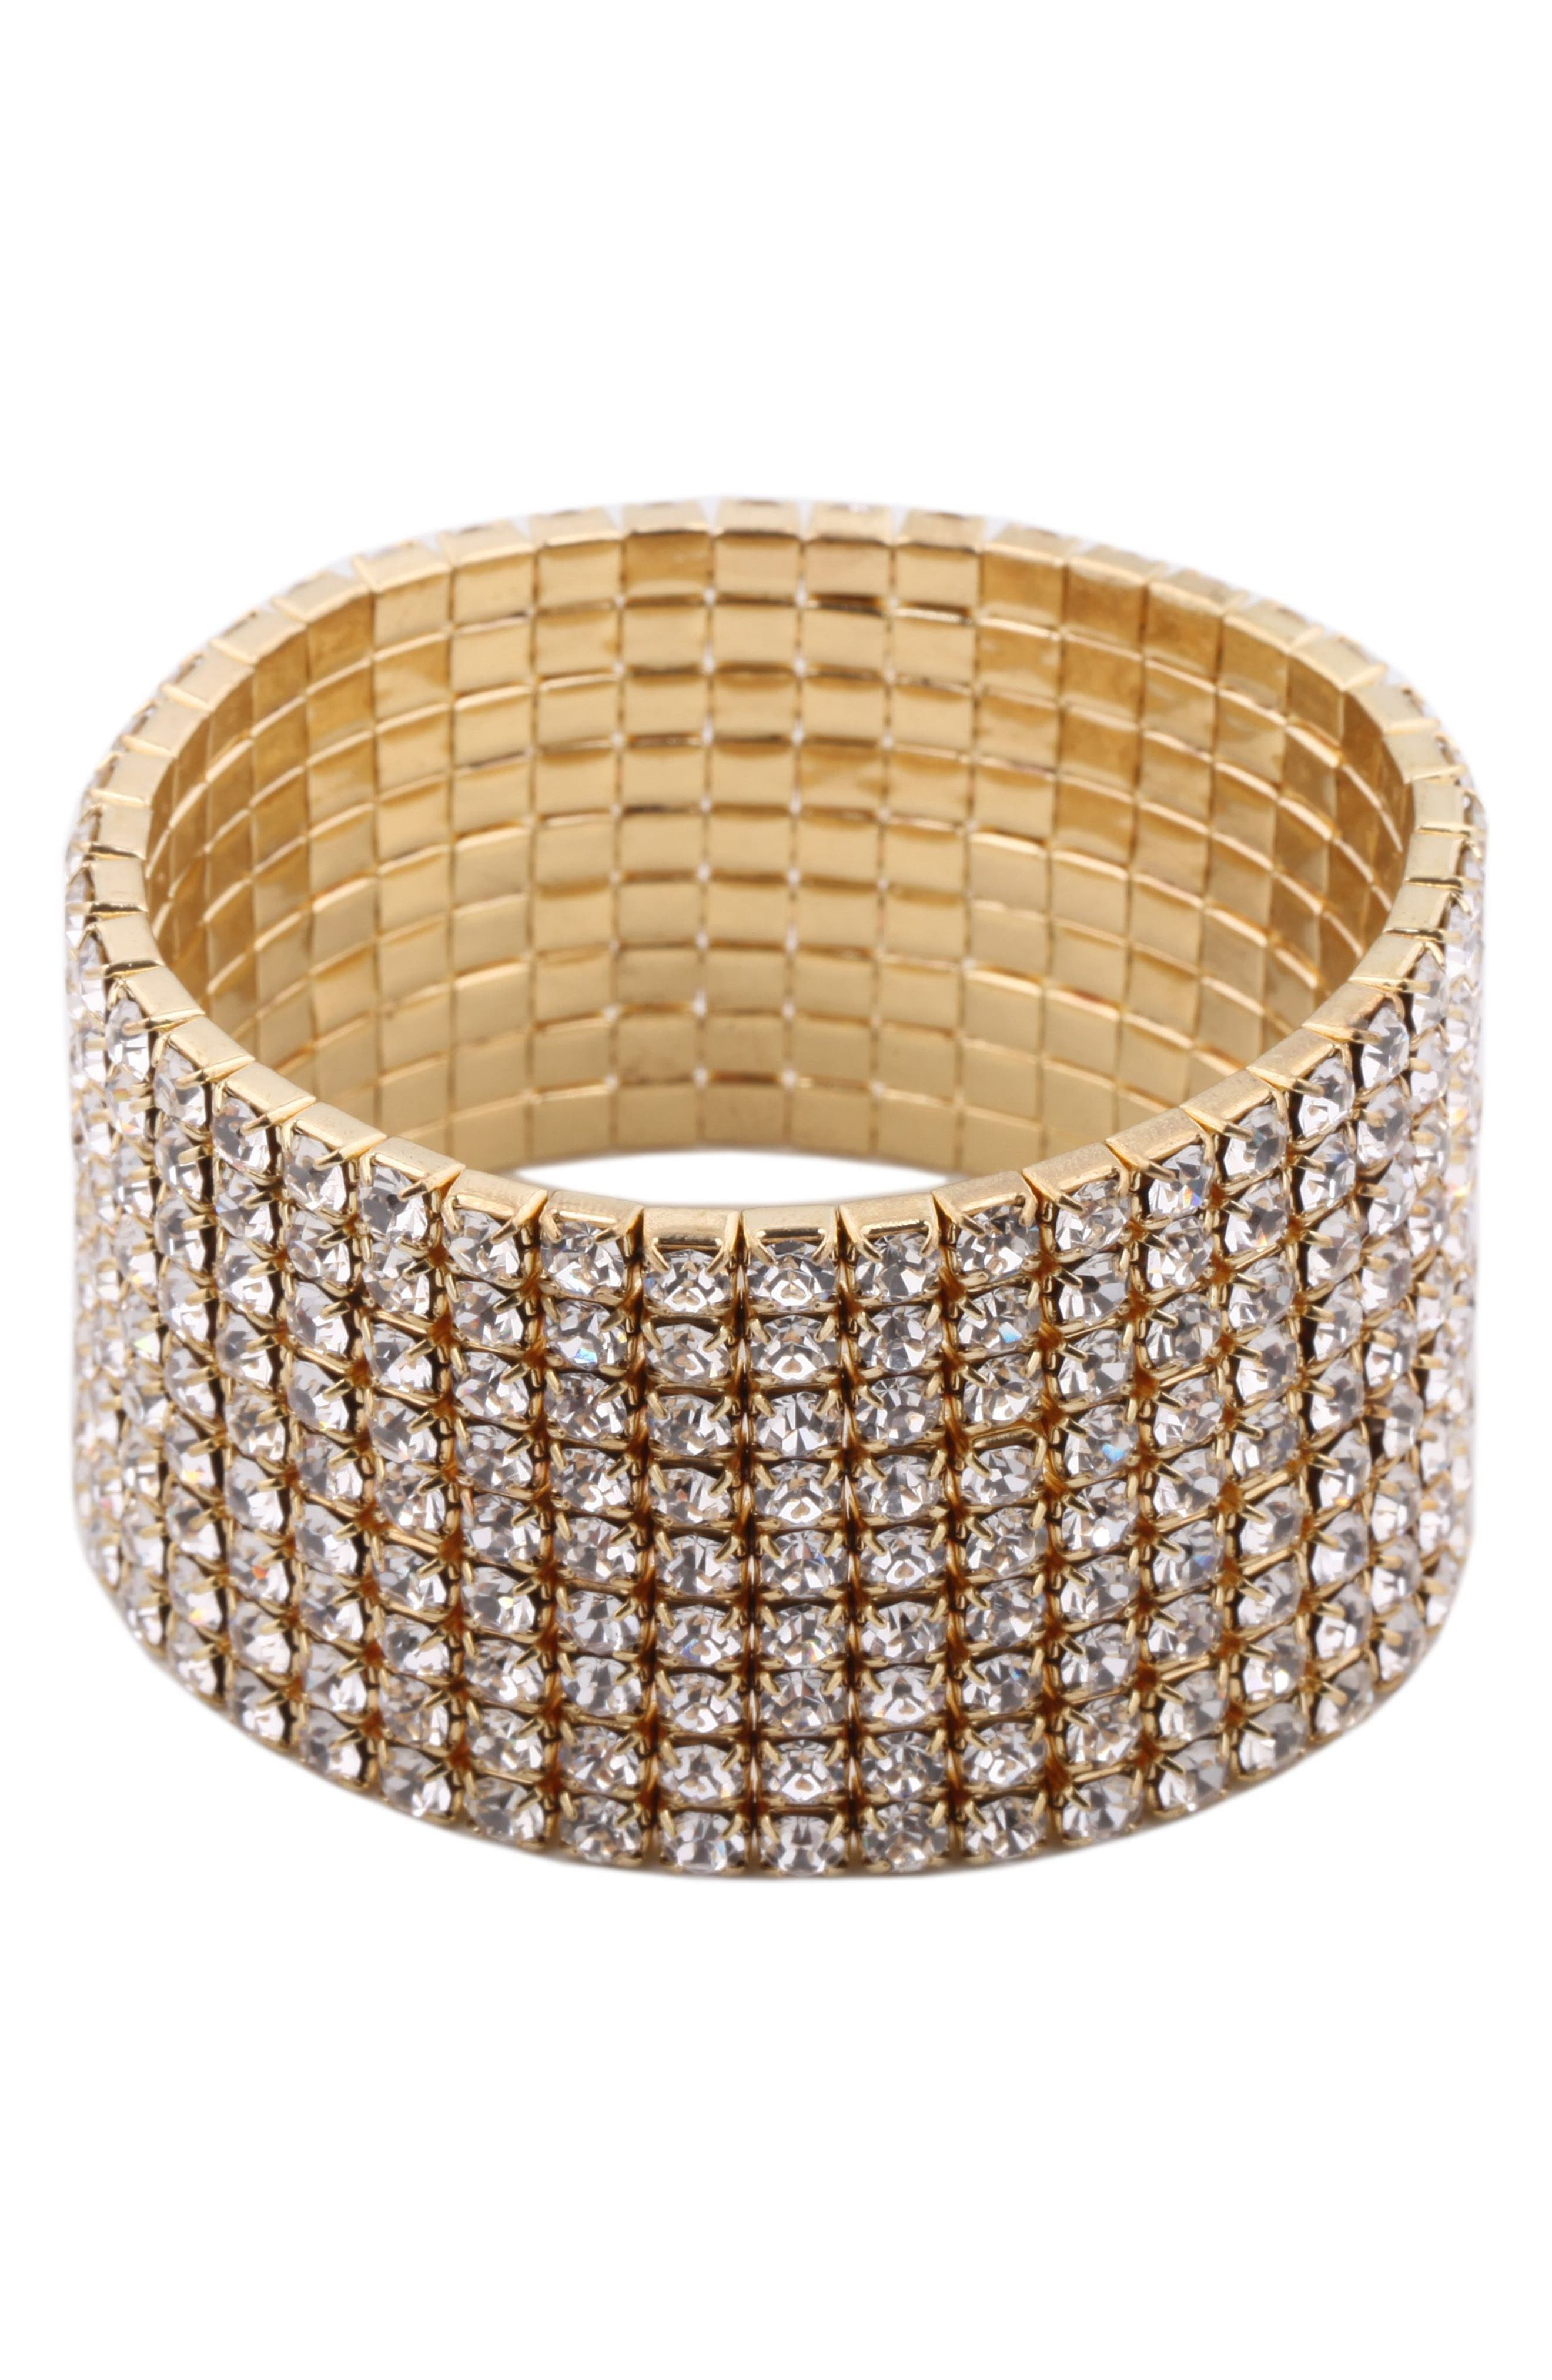 Crystal Stretch Crystal Bracelet,                             Main thumbnail 1, color,                             716